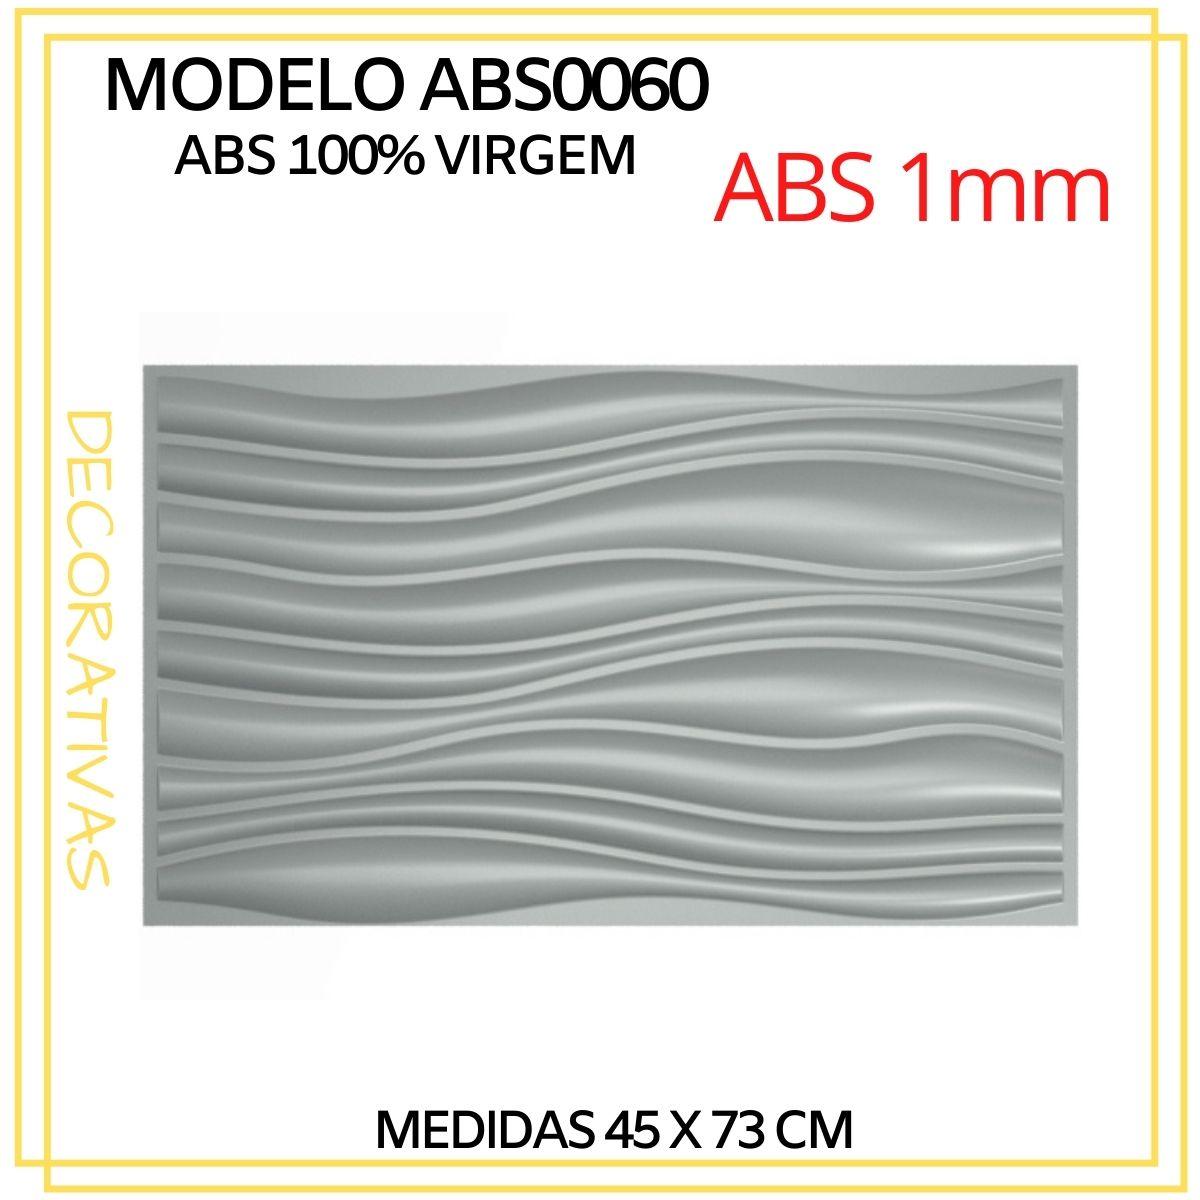 Forma De Gesso 3D em ABS - ABS0060-1MM 45x73cm